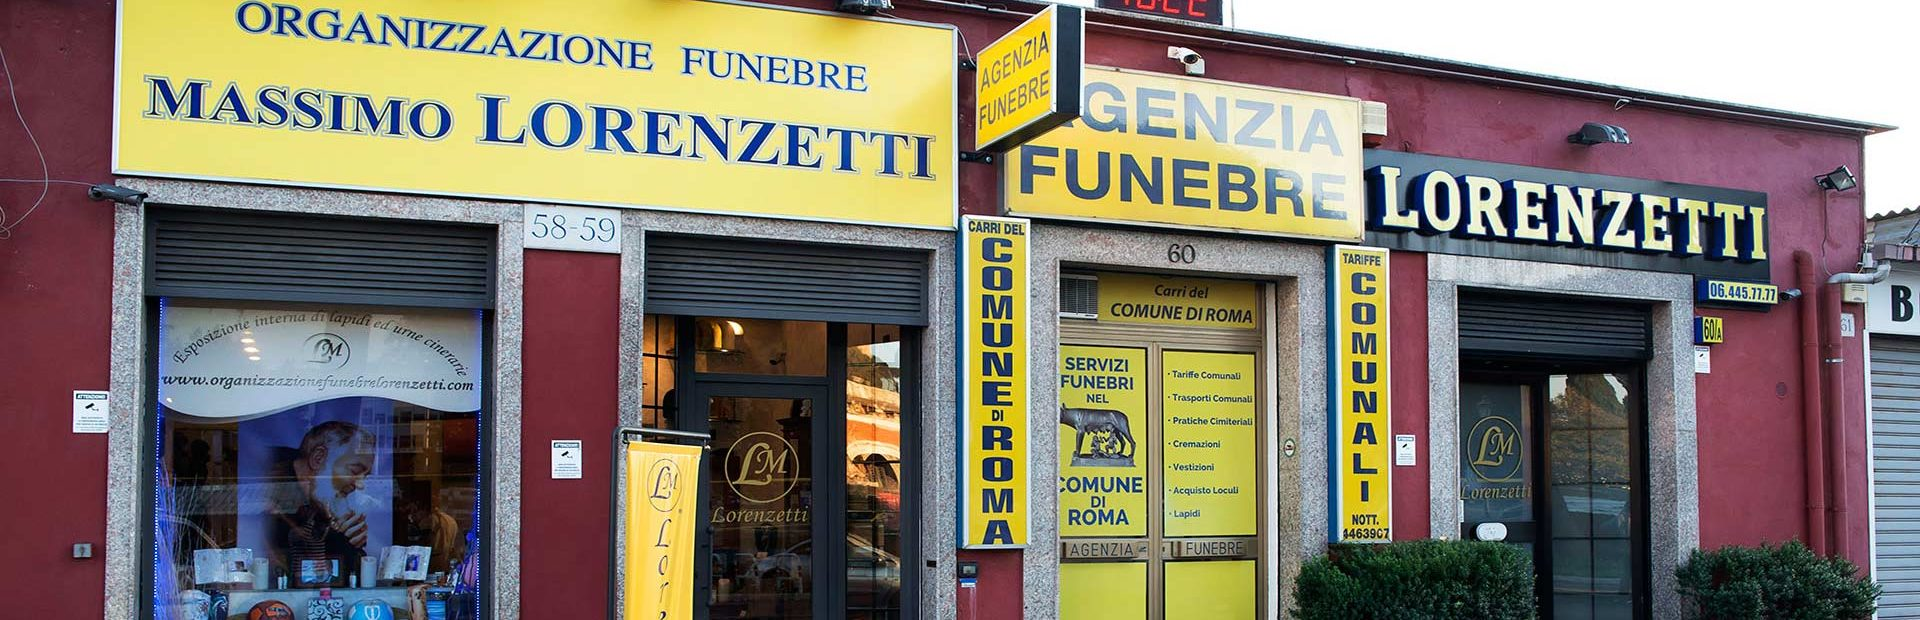 Onoranze Funebri a Roma Massimo Lorenzetti